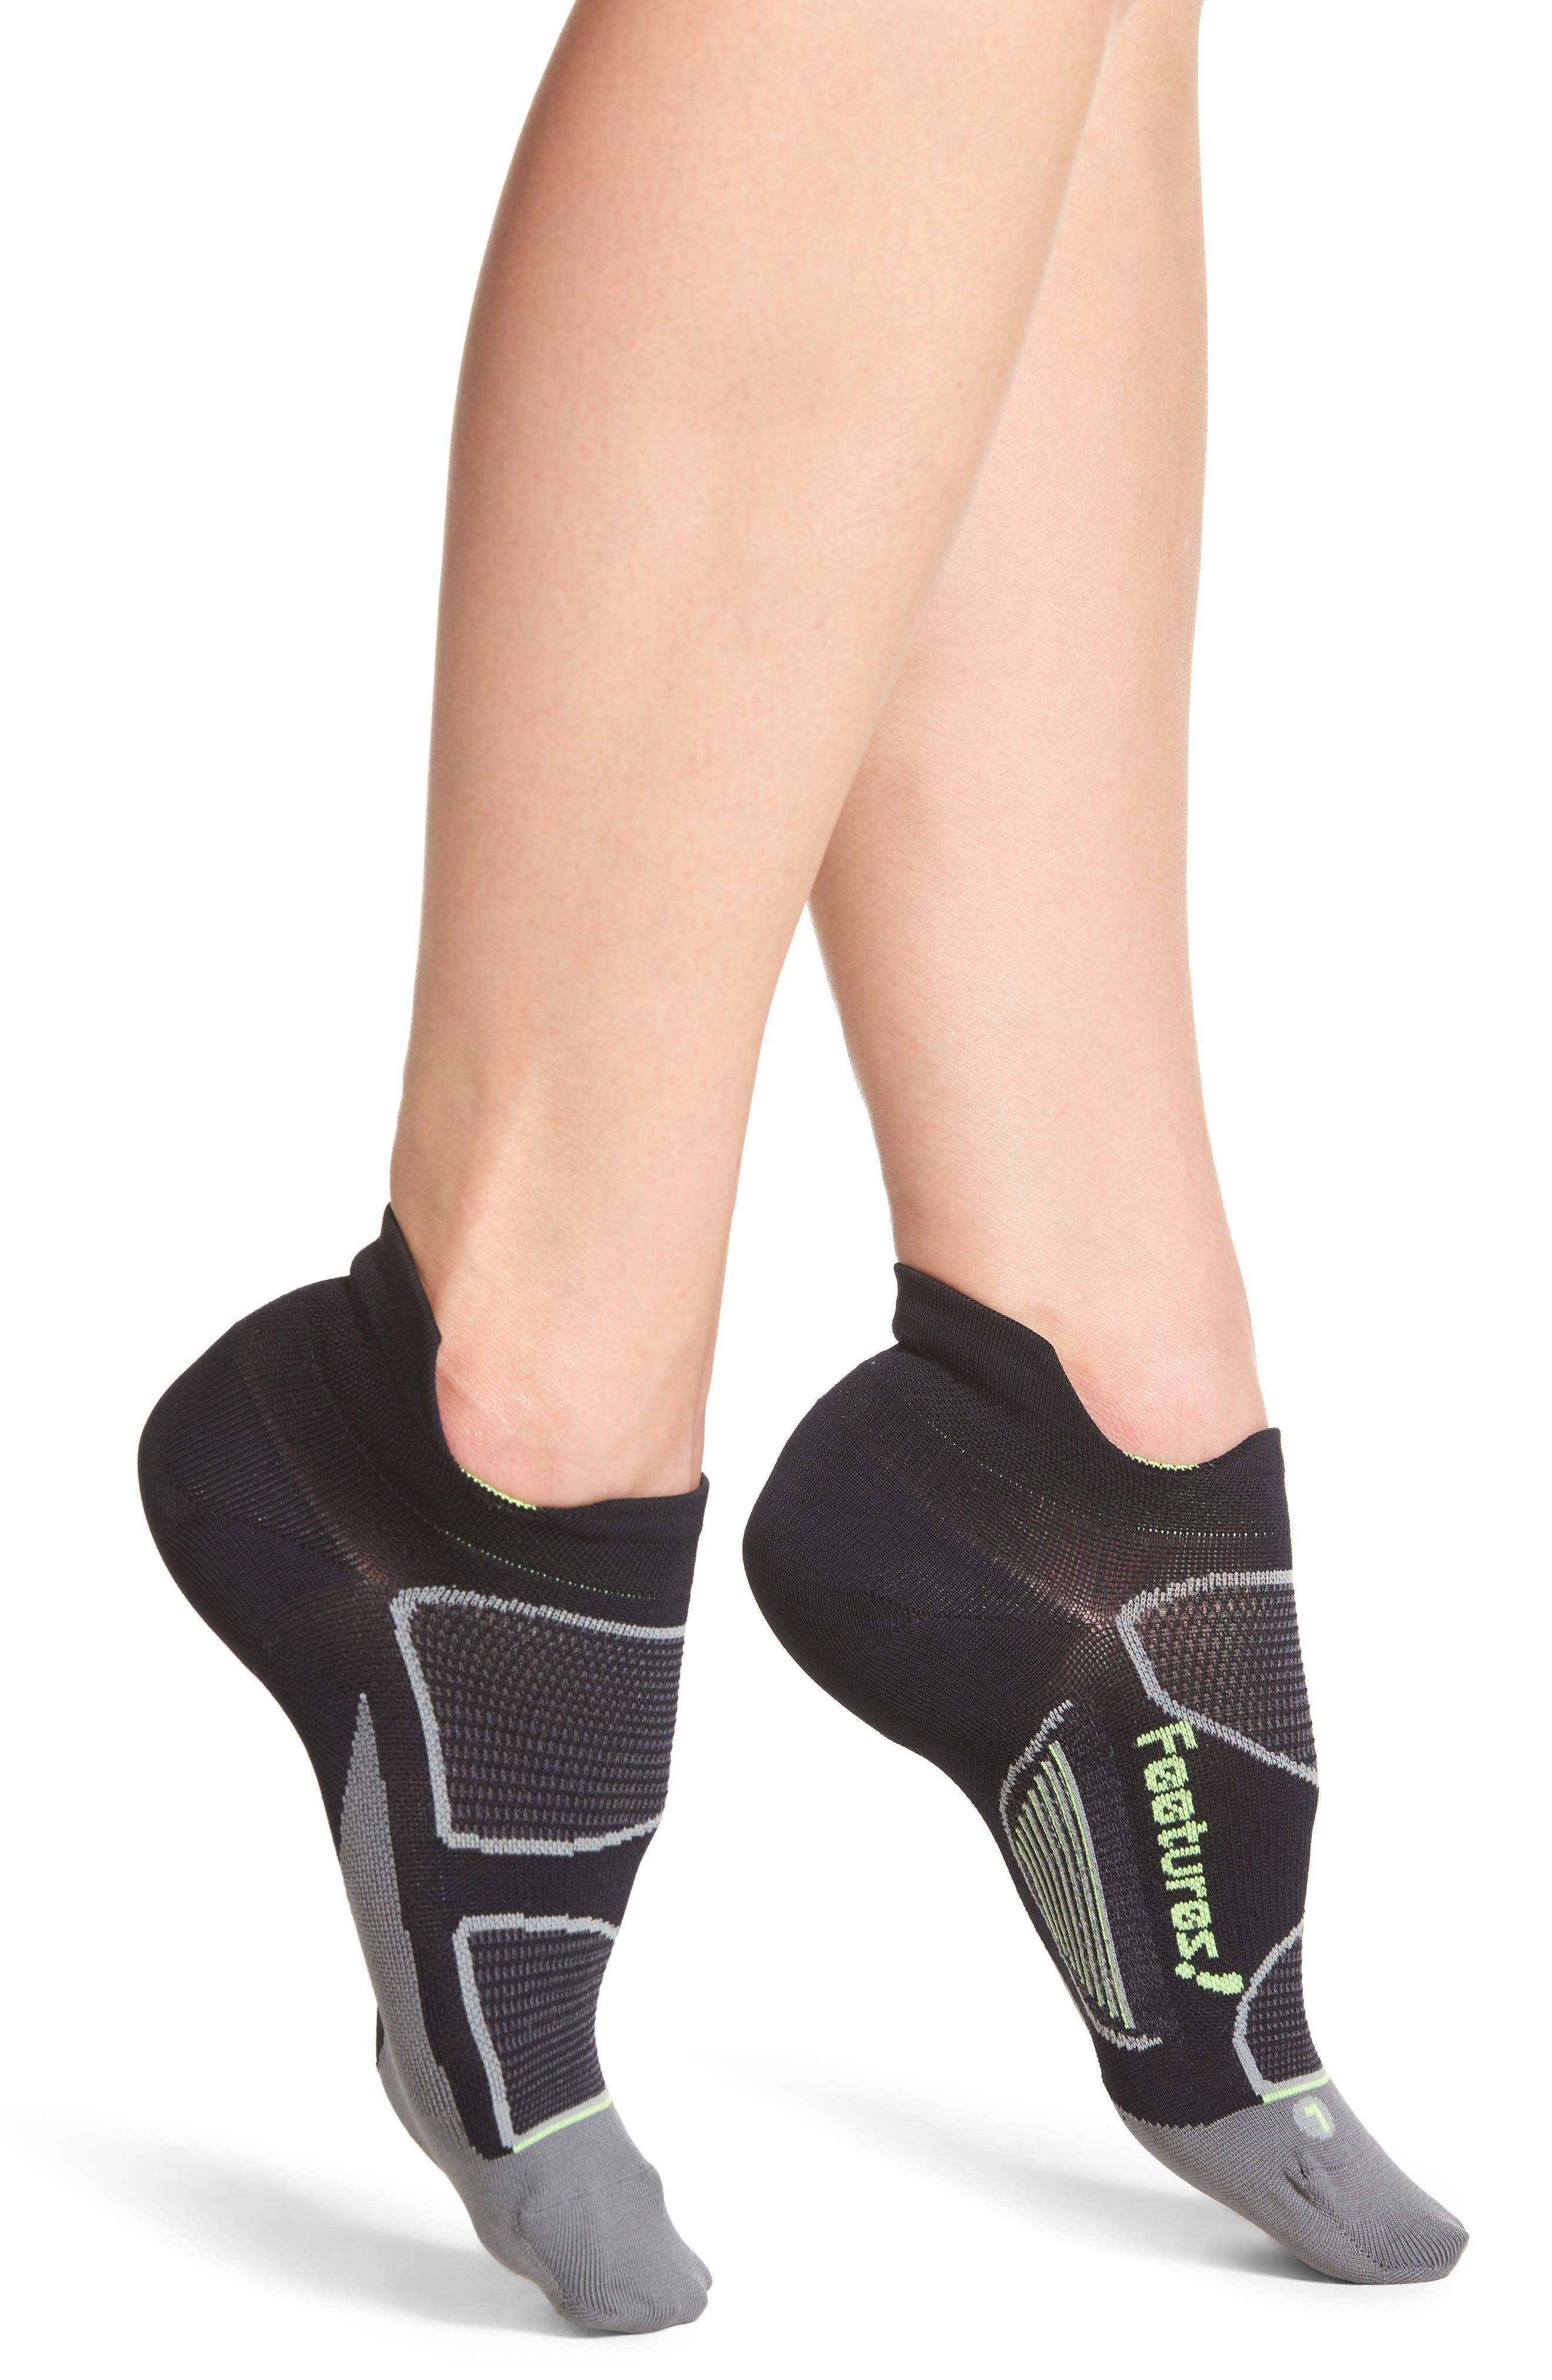 Elite Ultra Light No-Show Running Socks,                             Main thumbnail 1, color,                             002